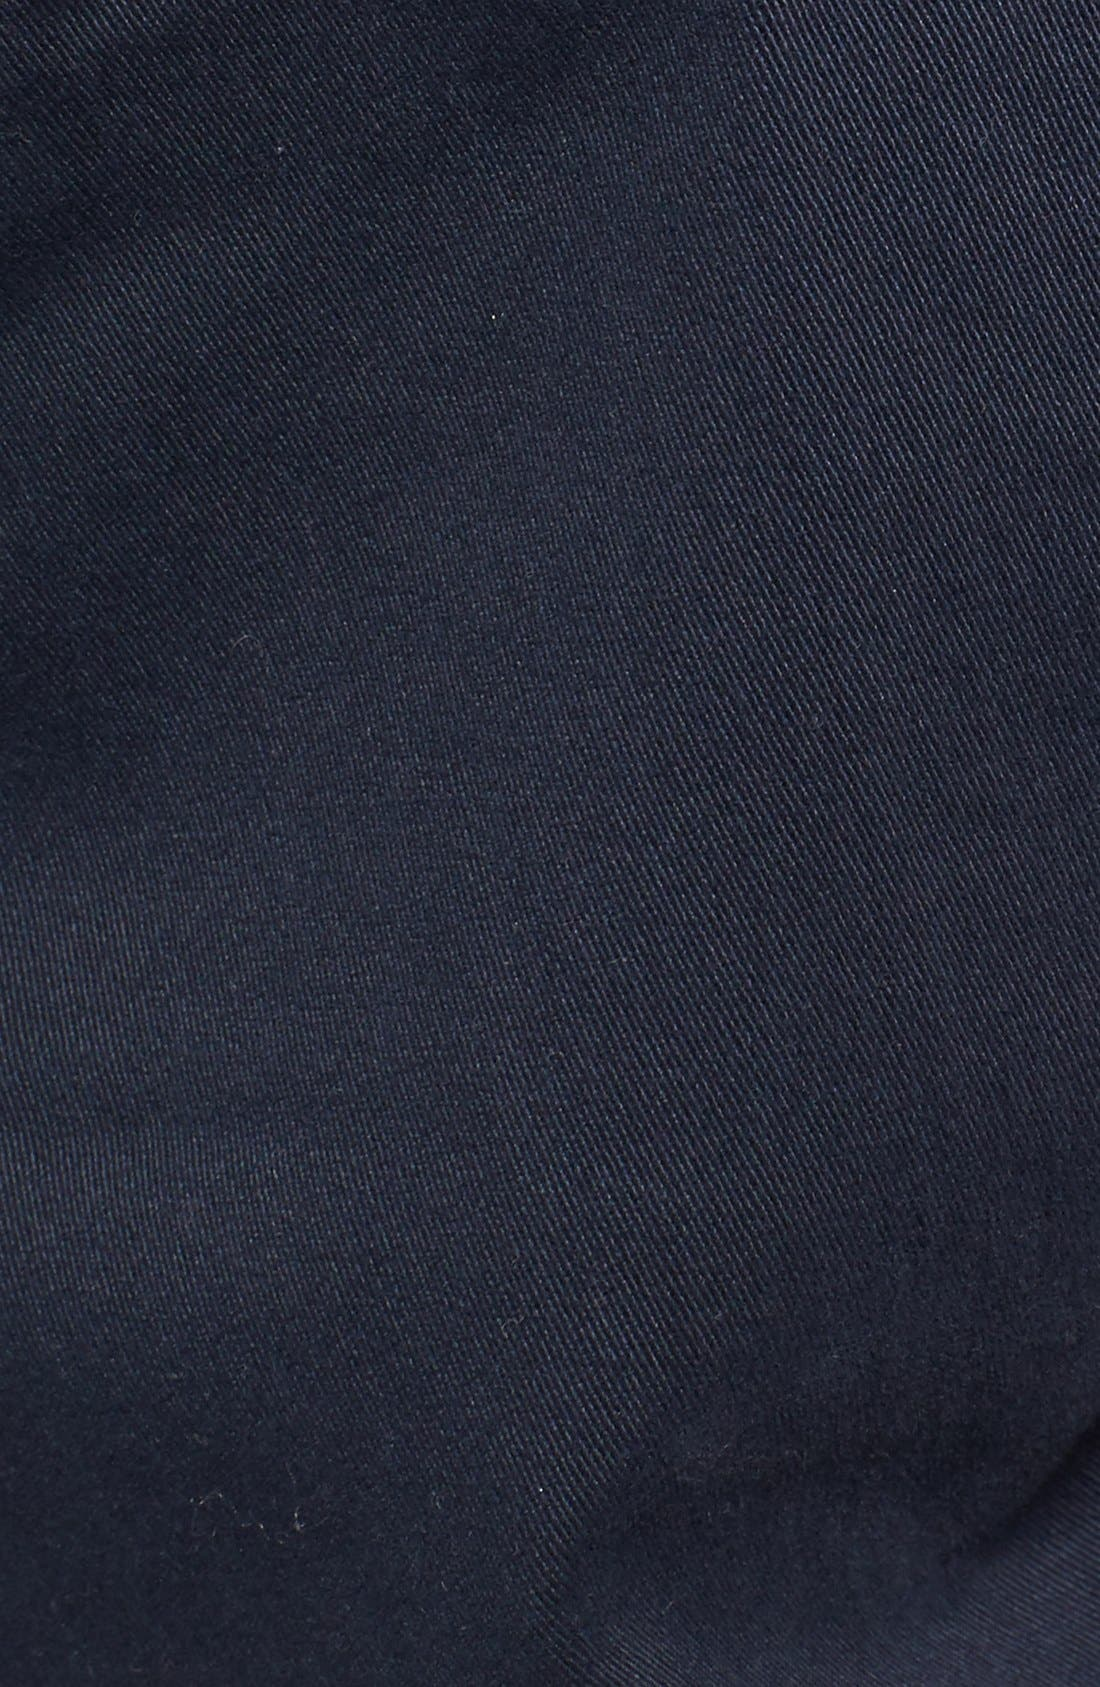 Sureshot Jogger Pants,                             Alternate thumbnail 5, color,                             Navy